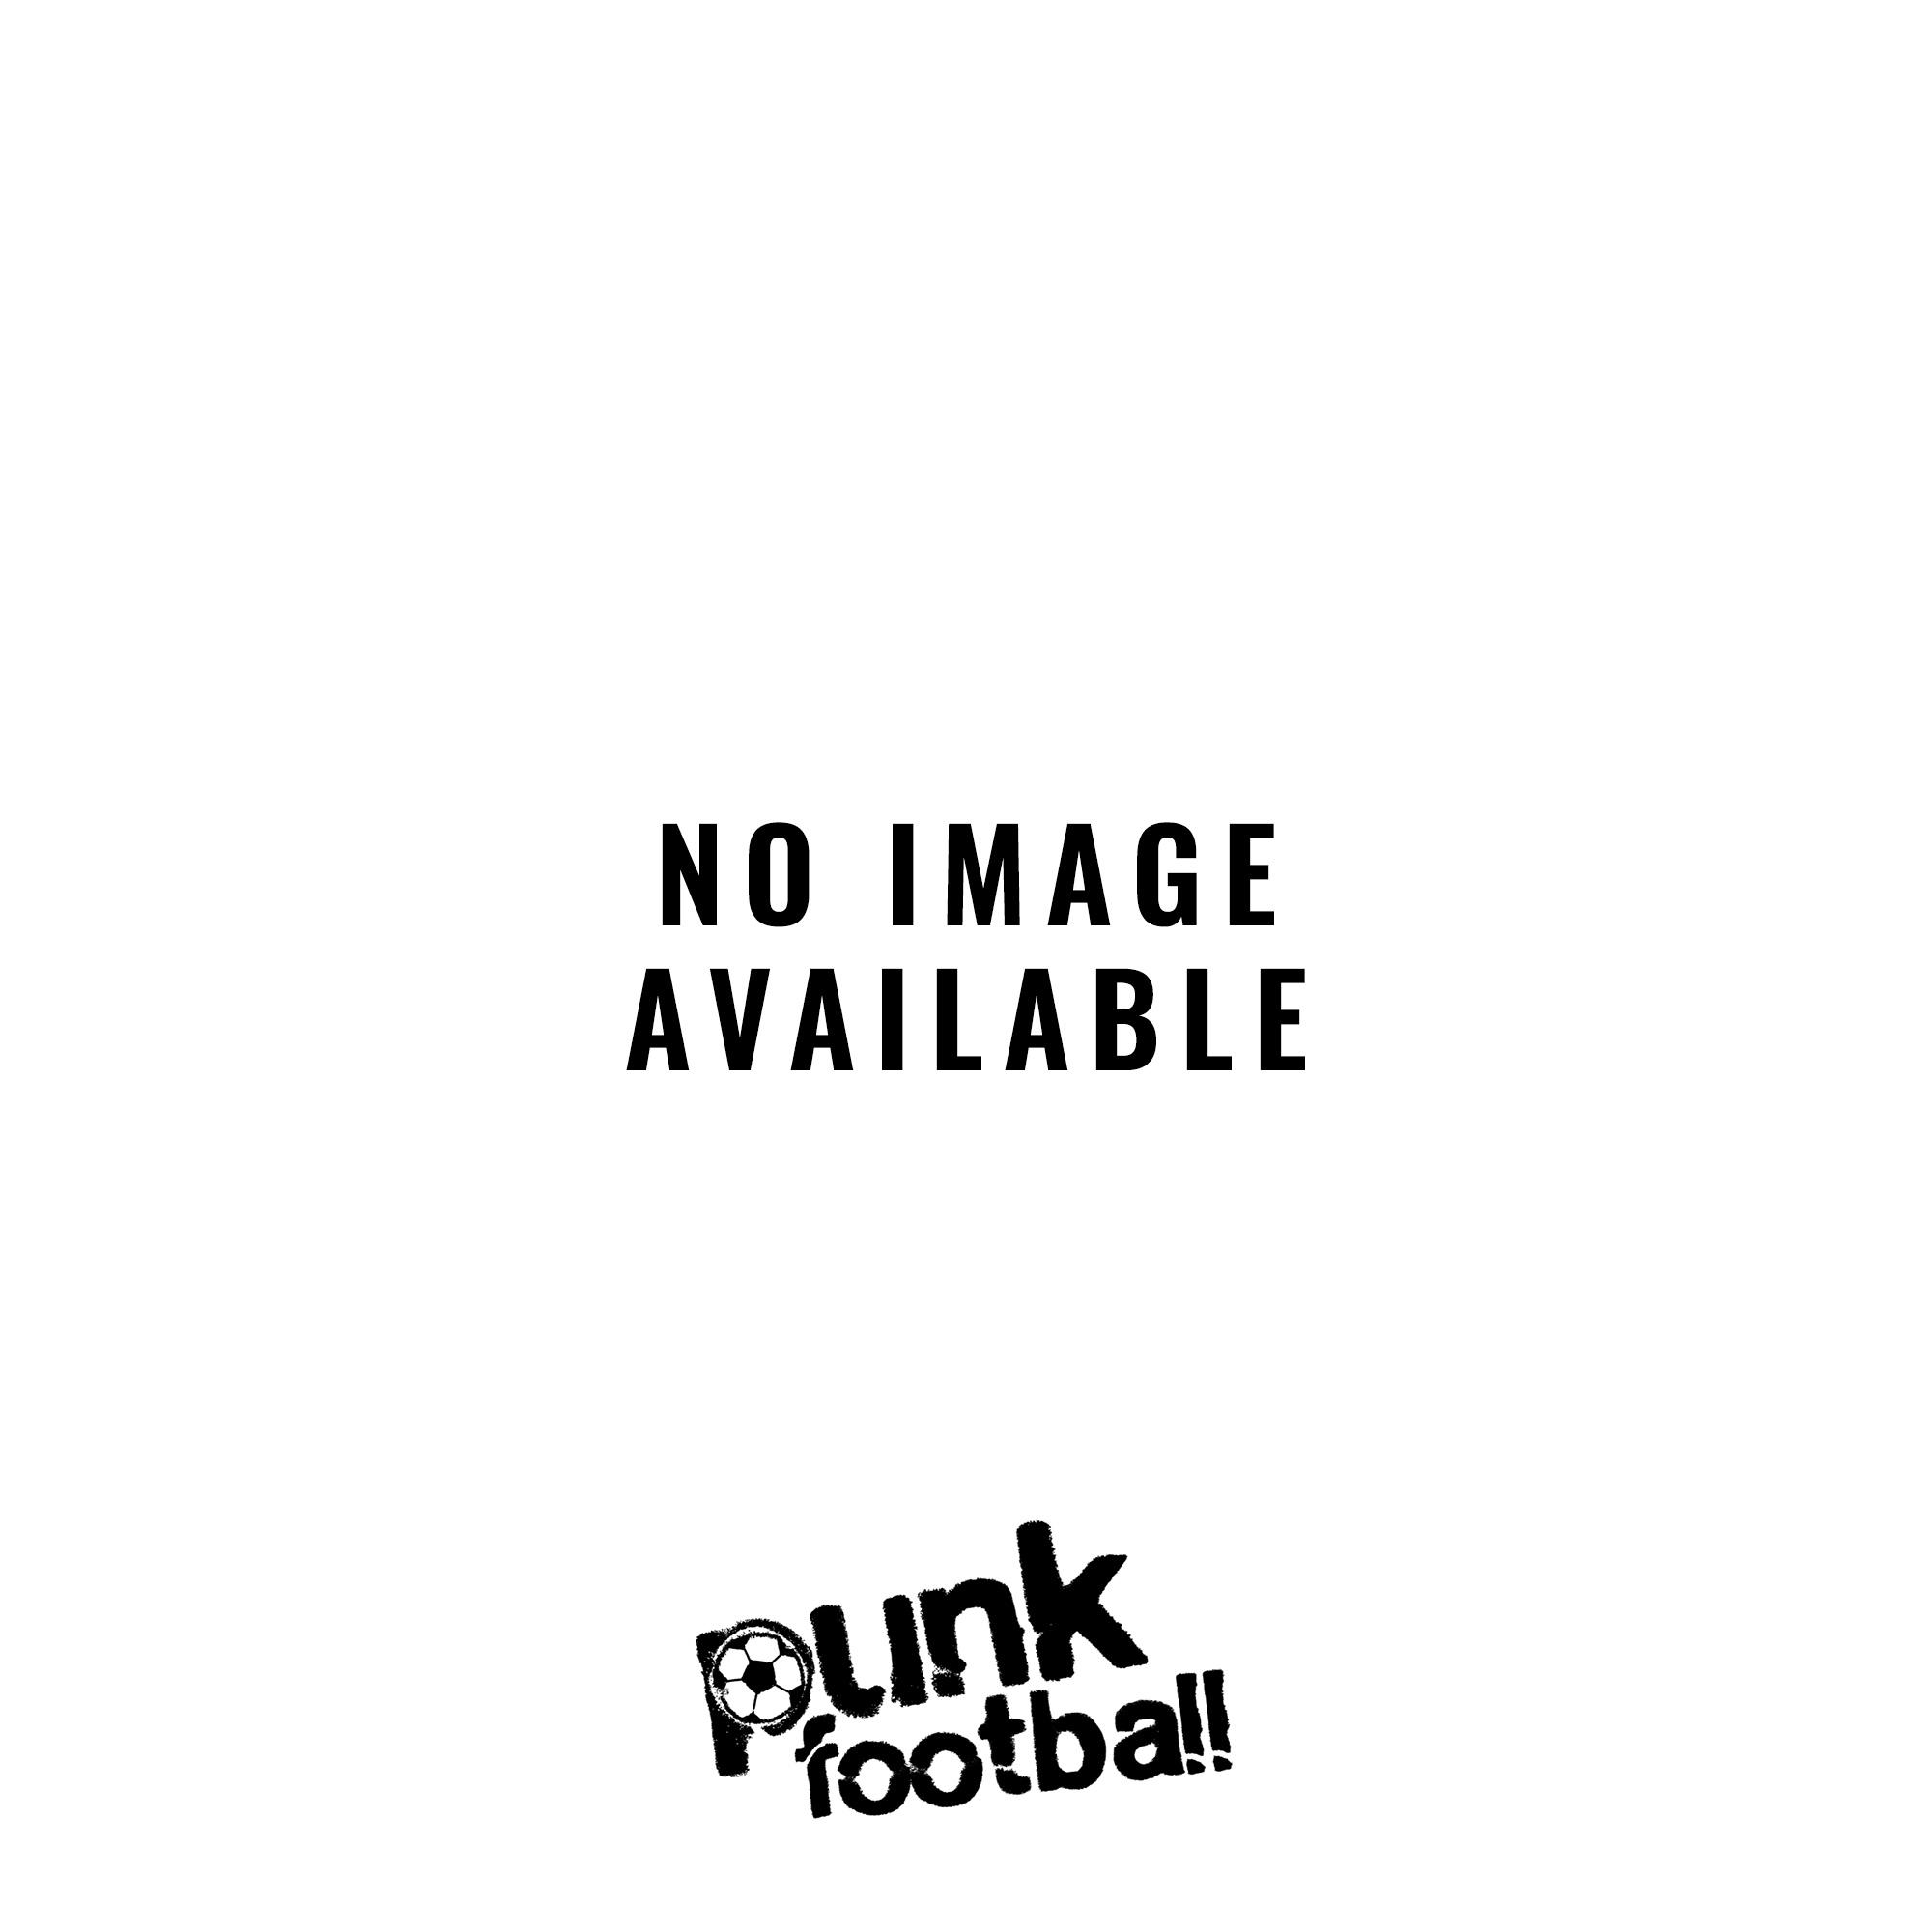 The South East (Gillingham) Hooded Sweatshirt